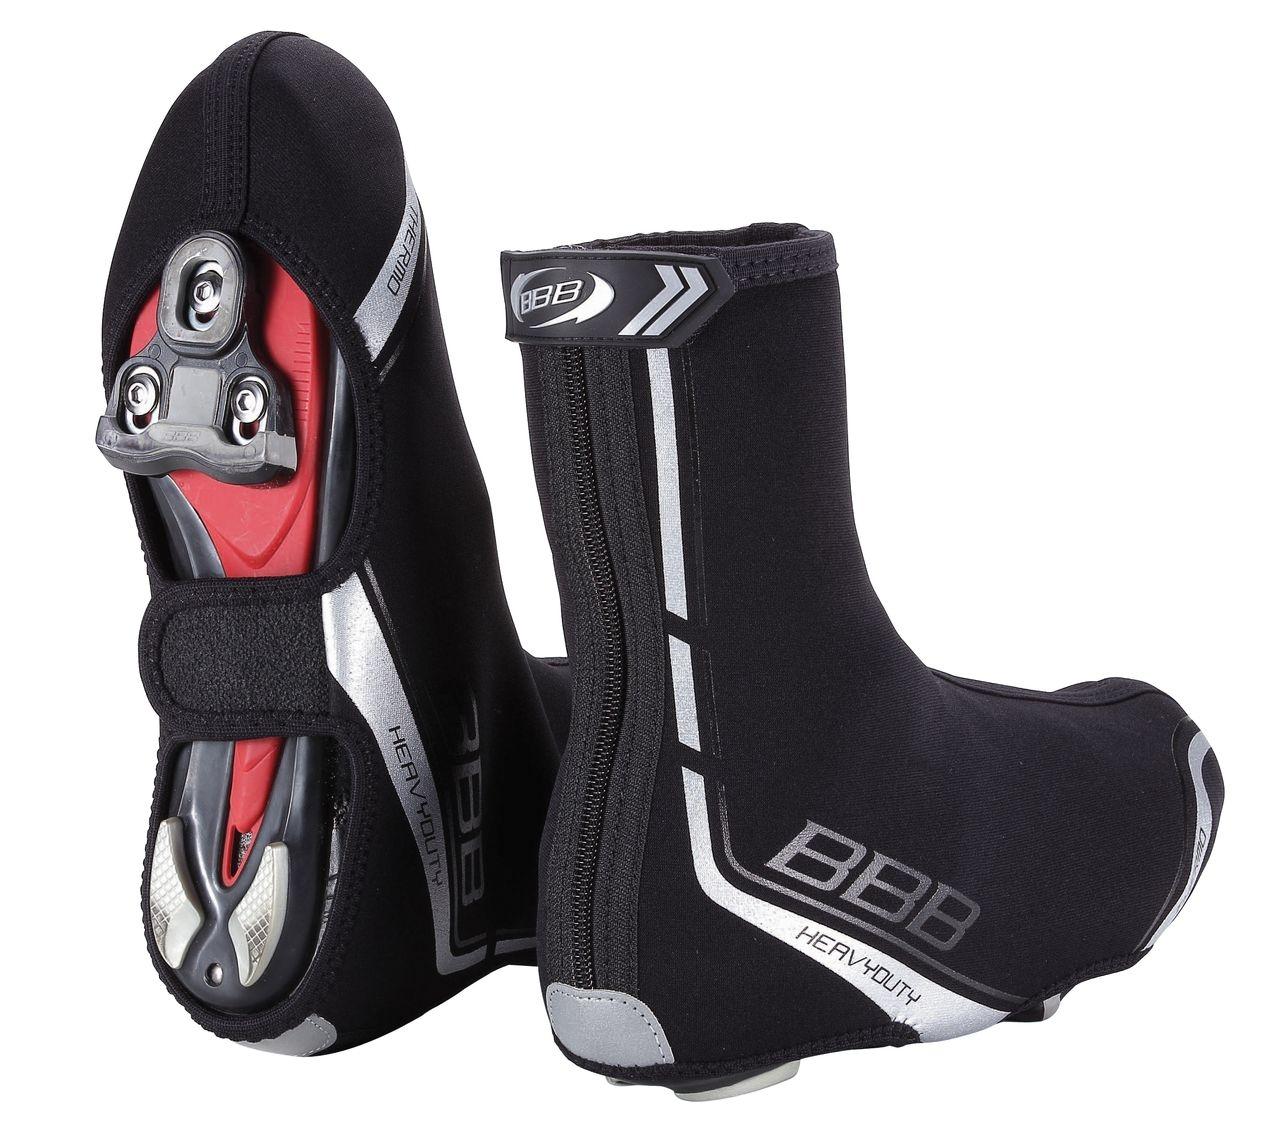 Couvre-chaussures BBB HeavyDuty OSS Noir - BWS-02B - 47/48